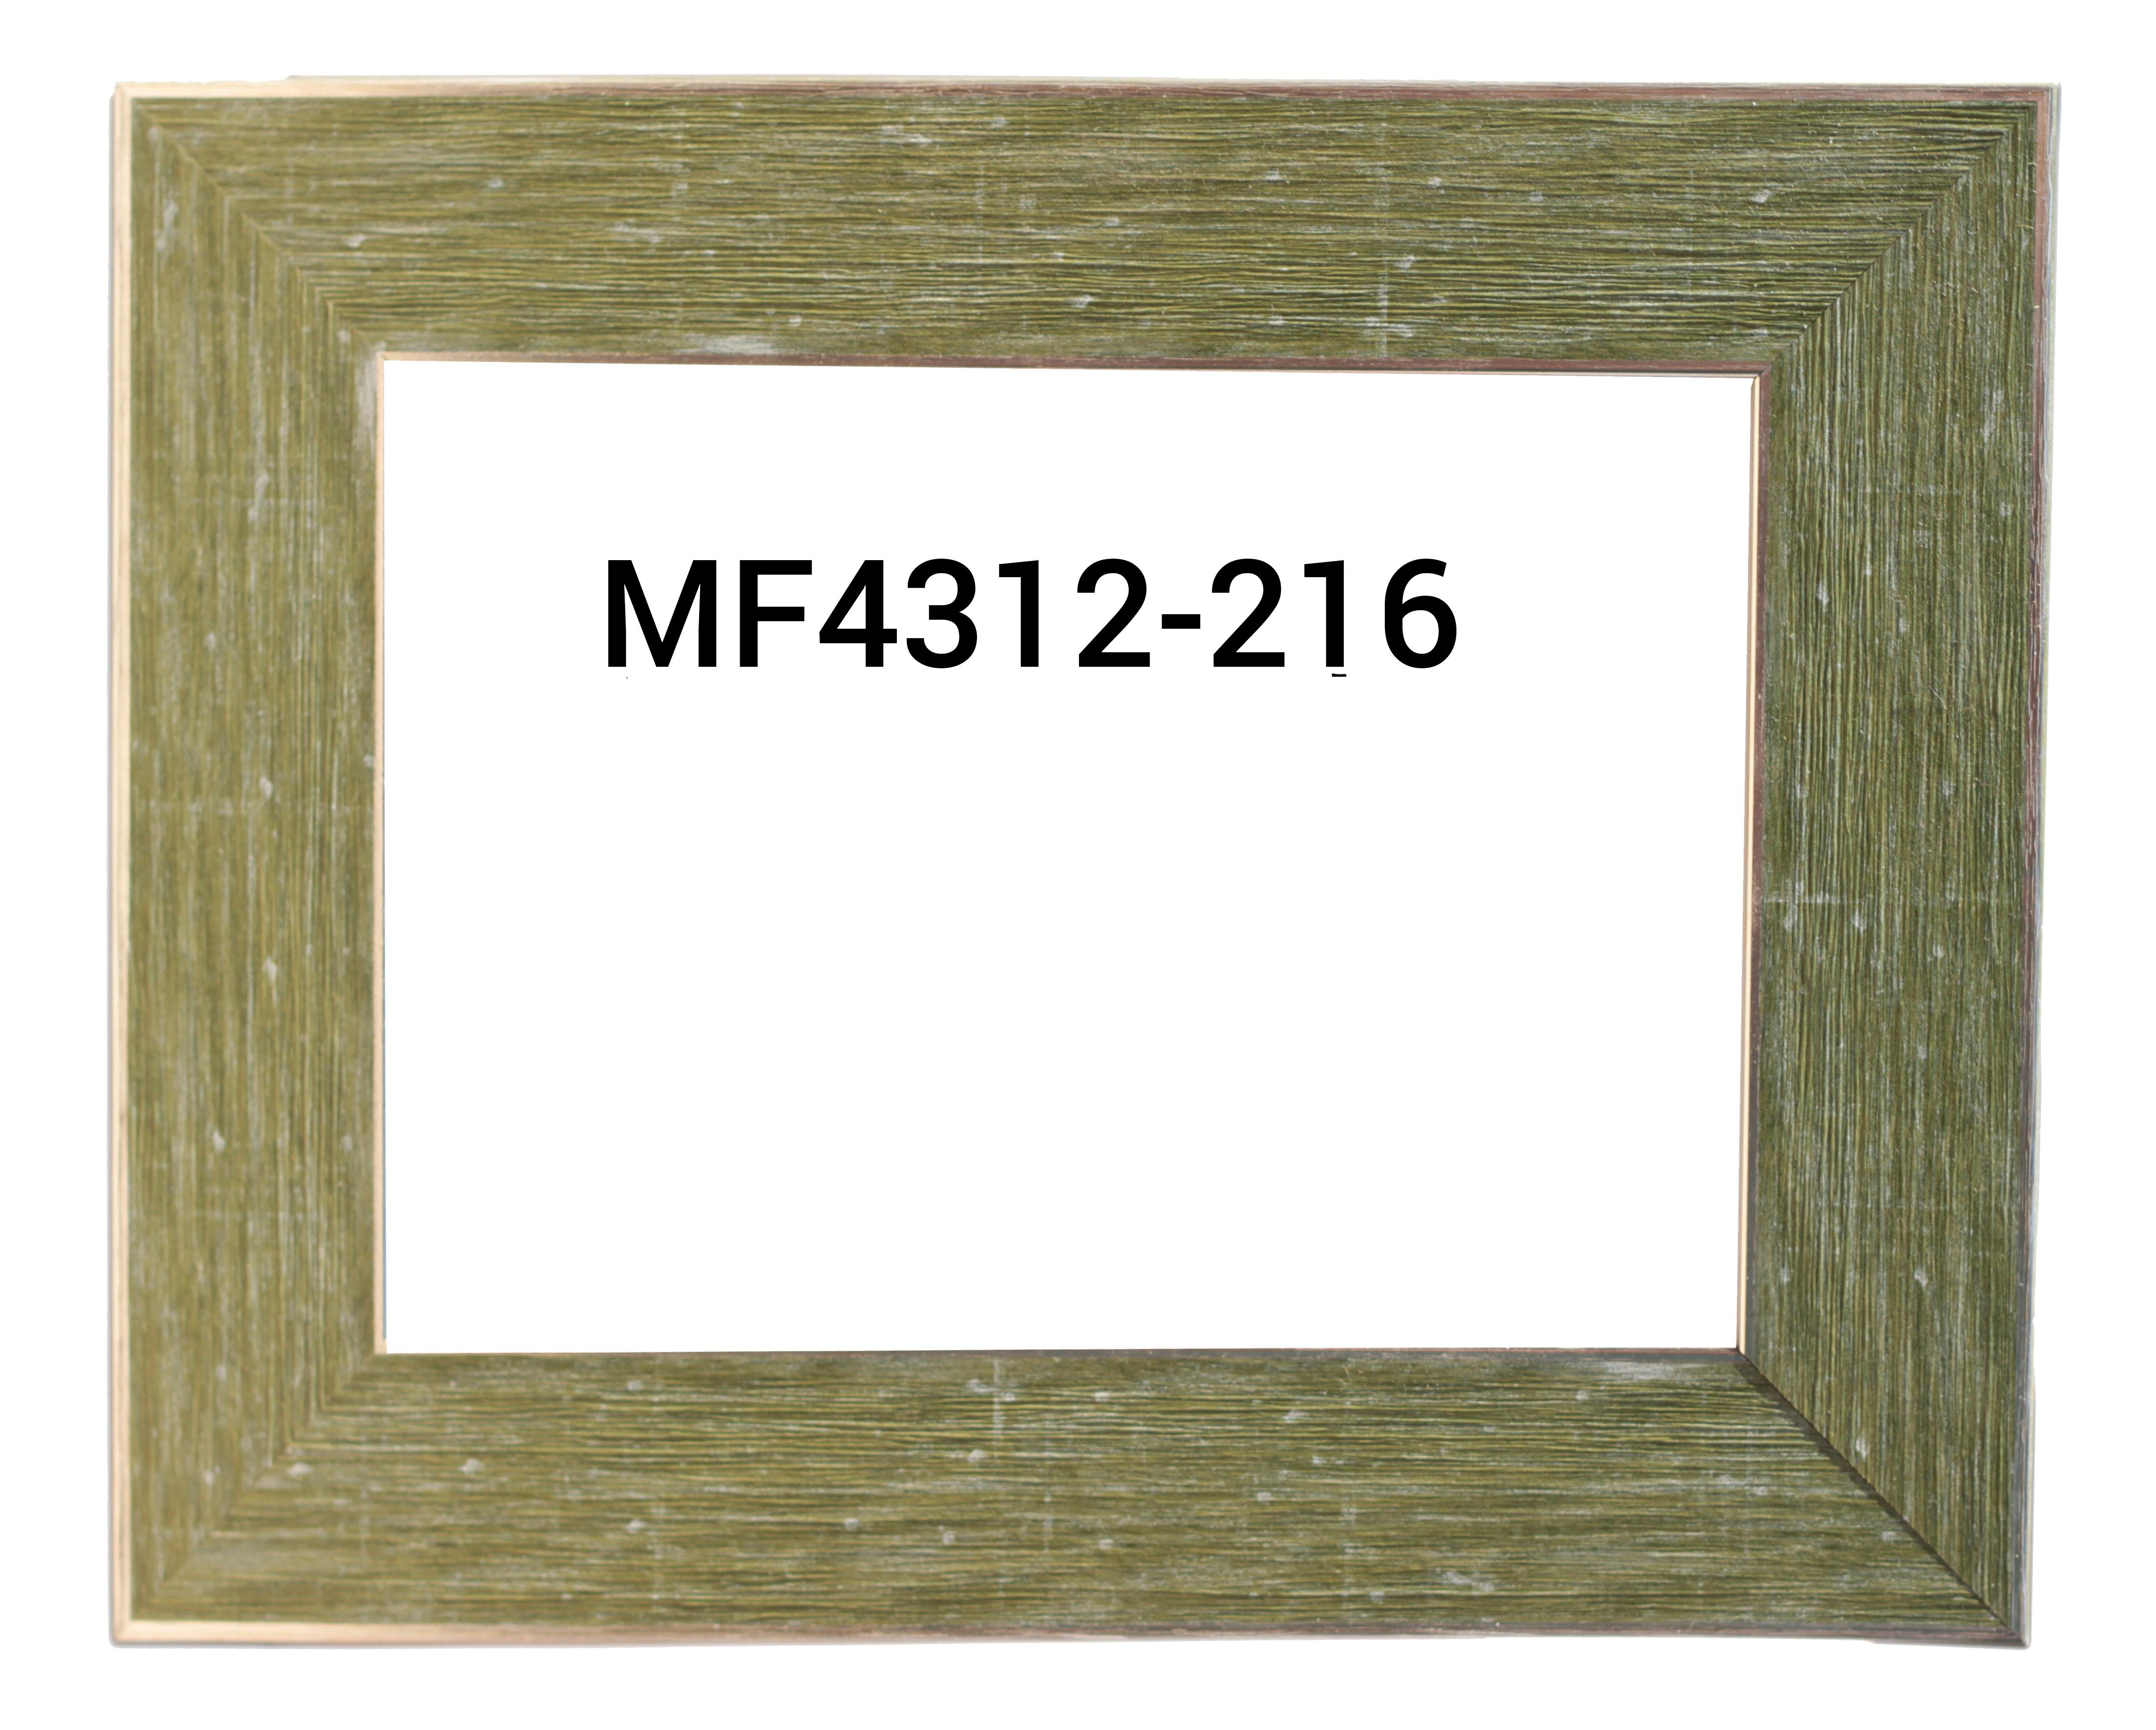 4312-216